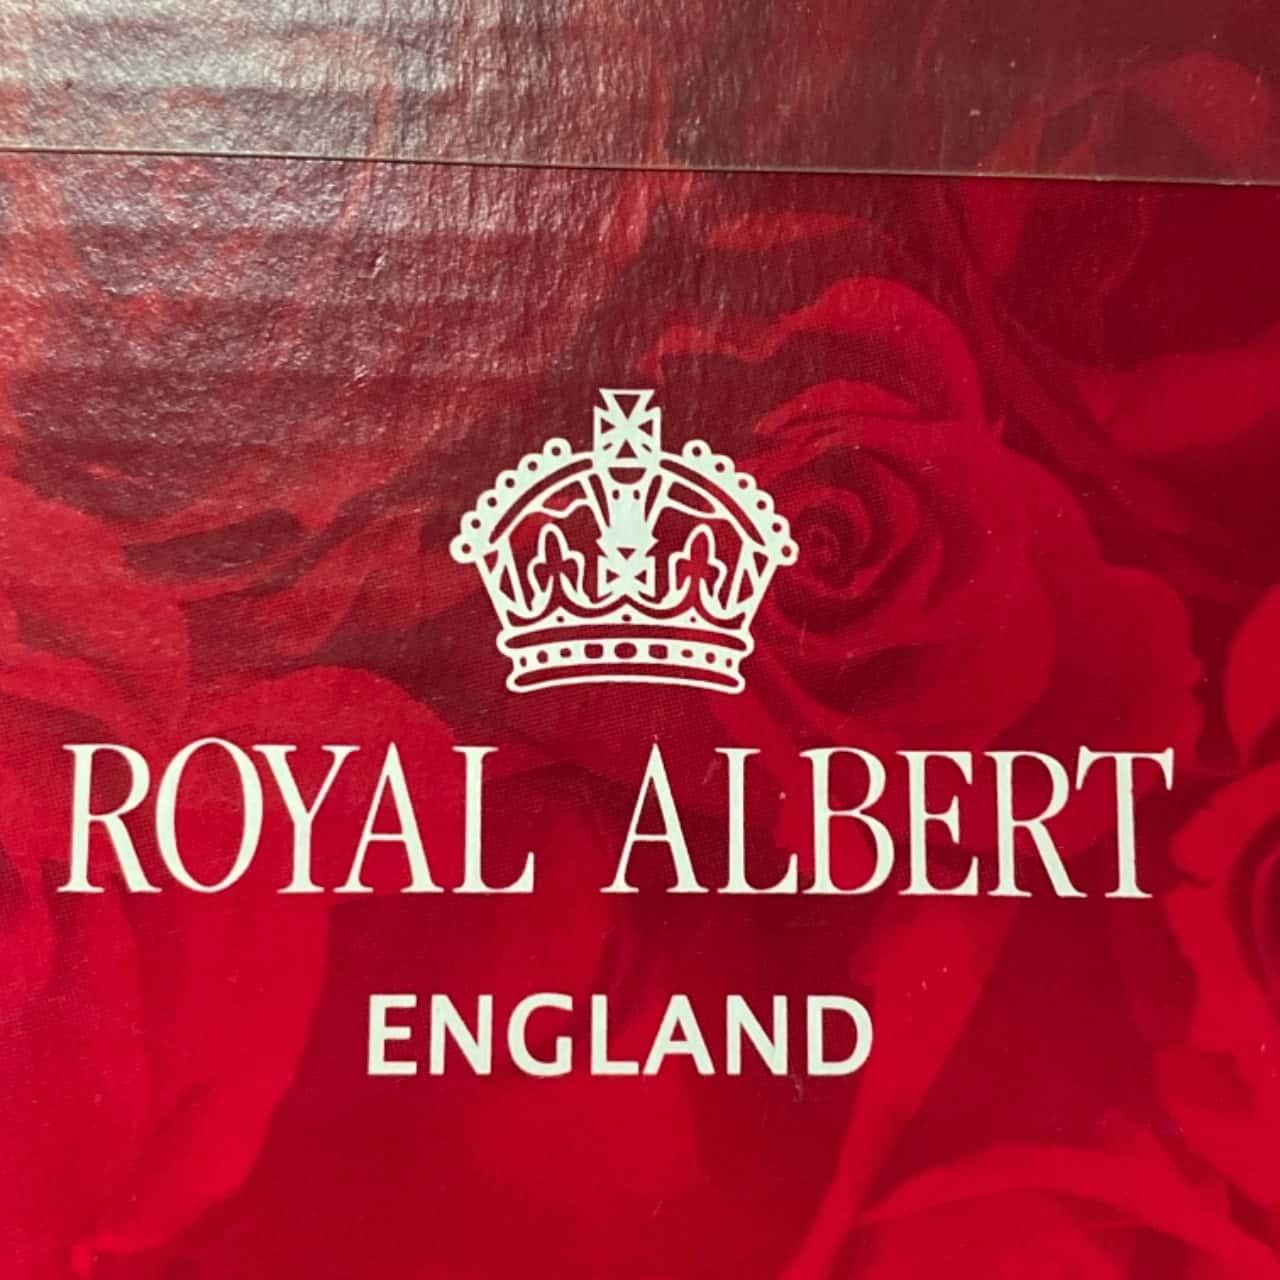 Royal Albert Christmas decorations